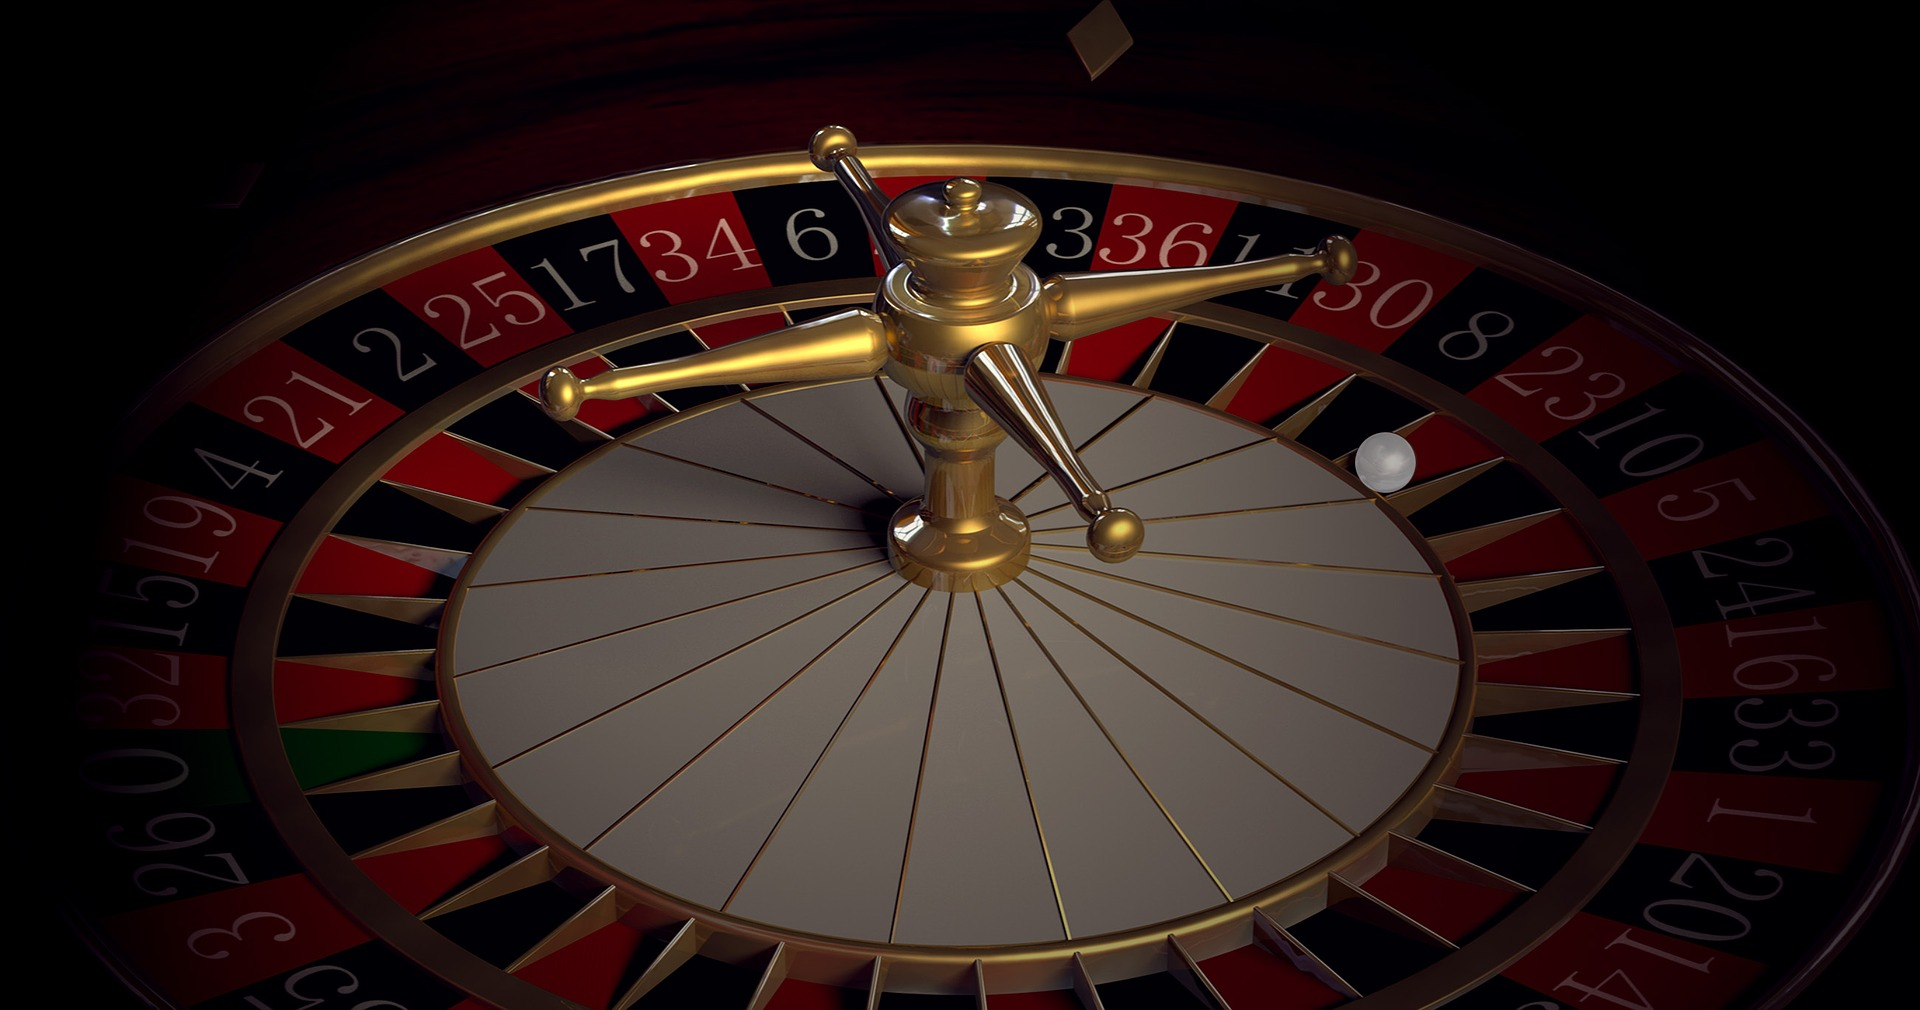 Riobet casino no deposit